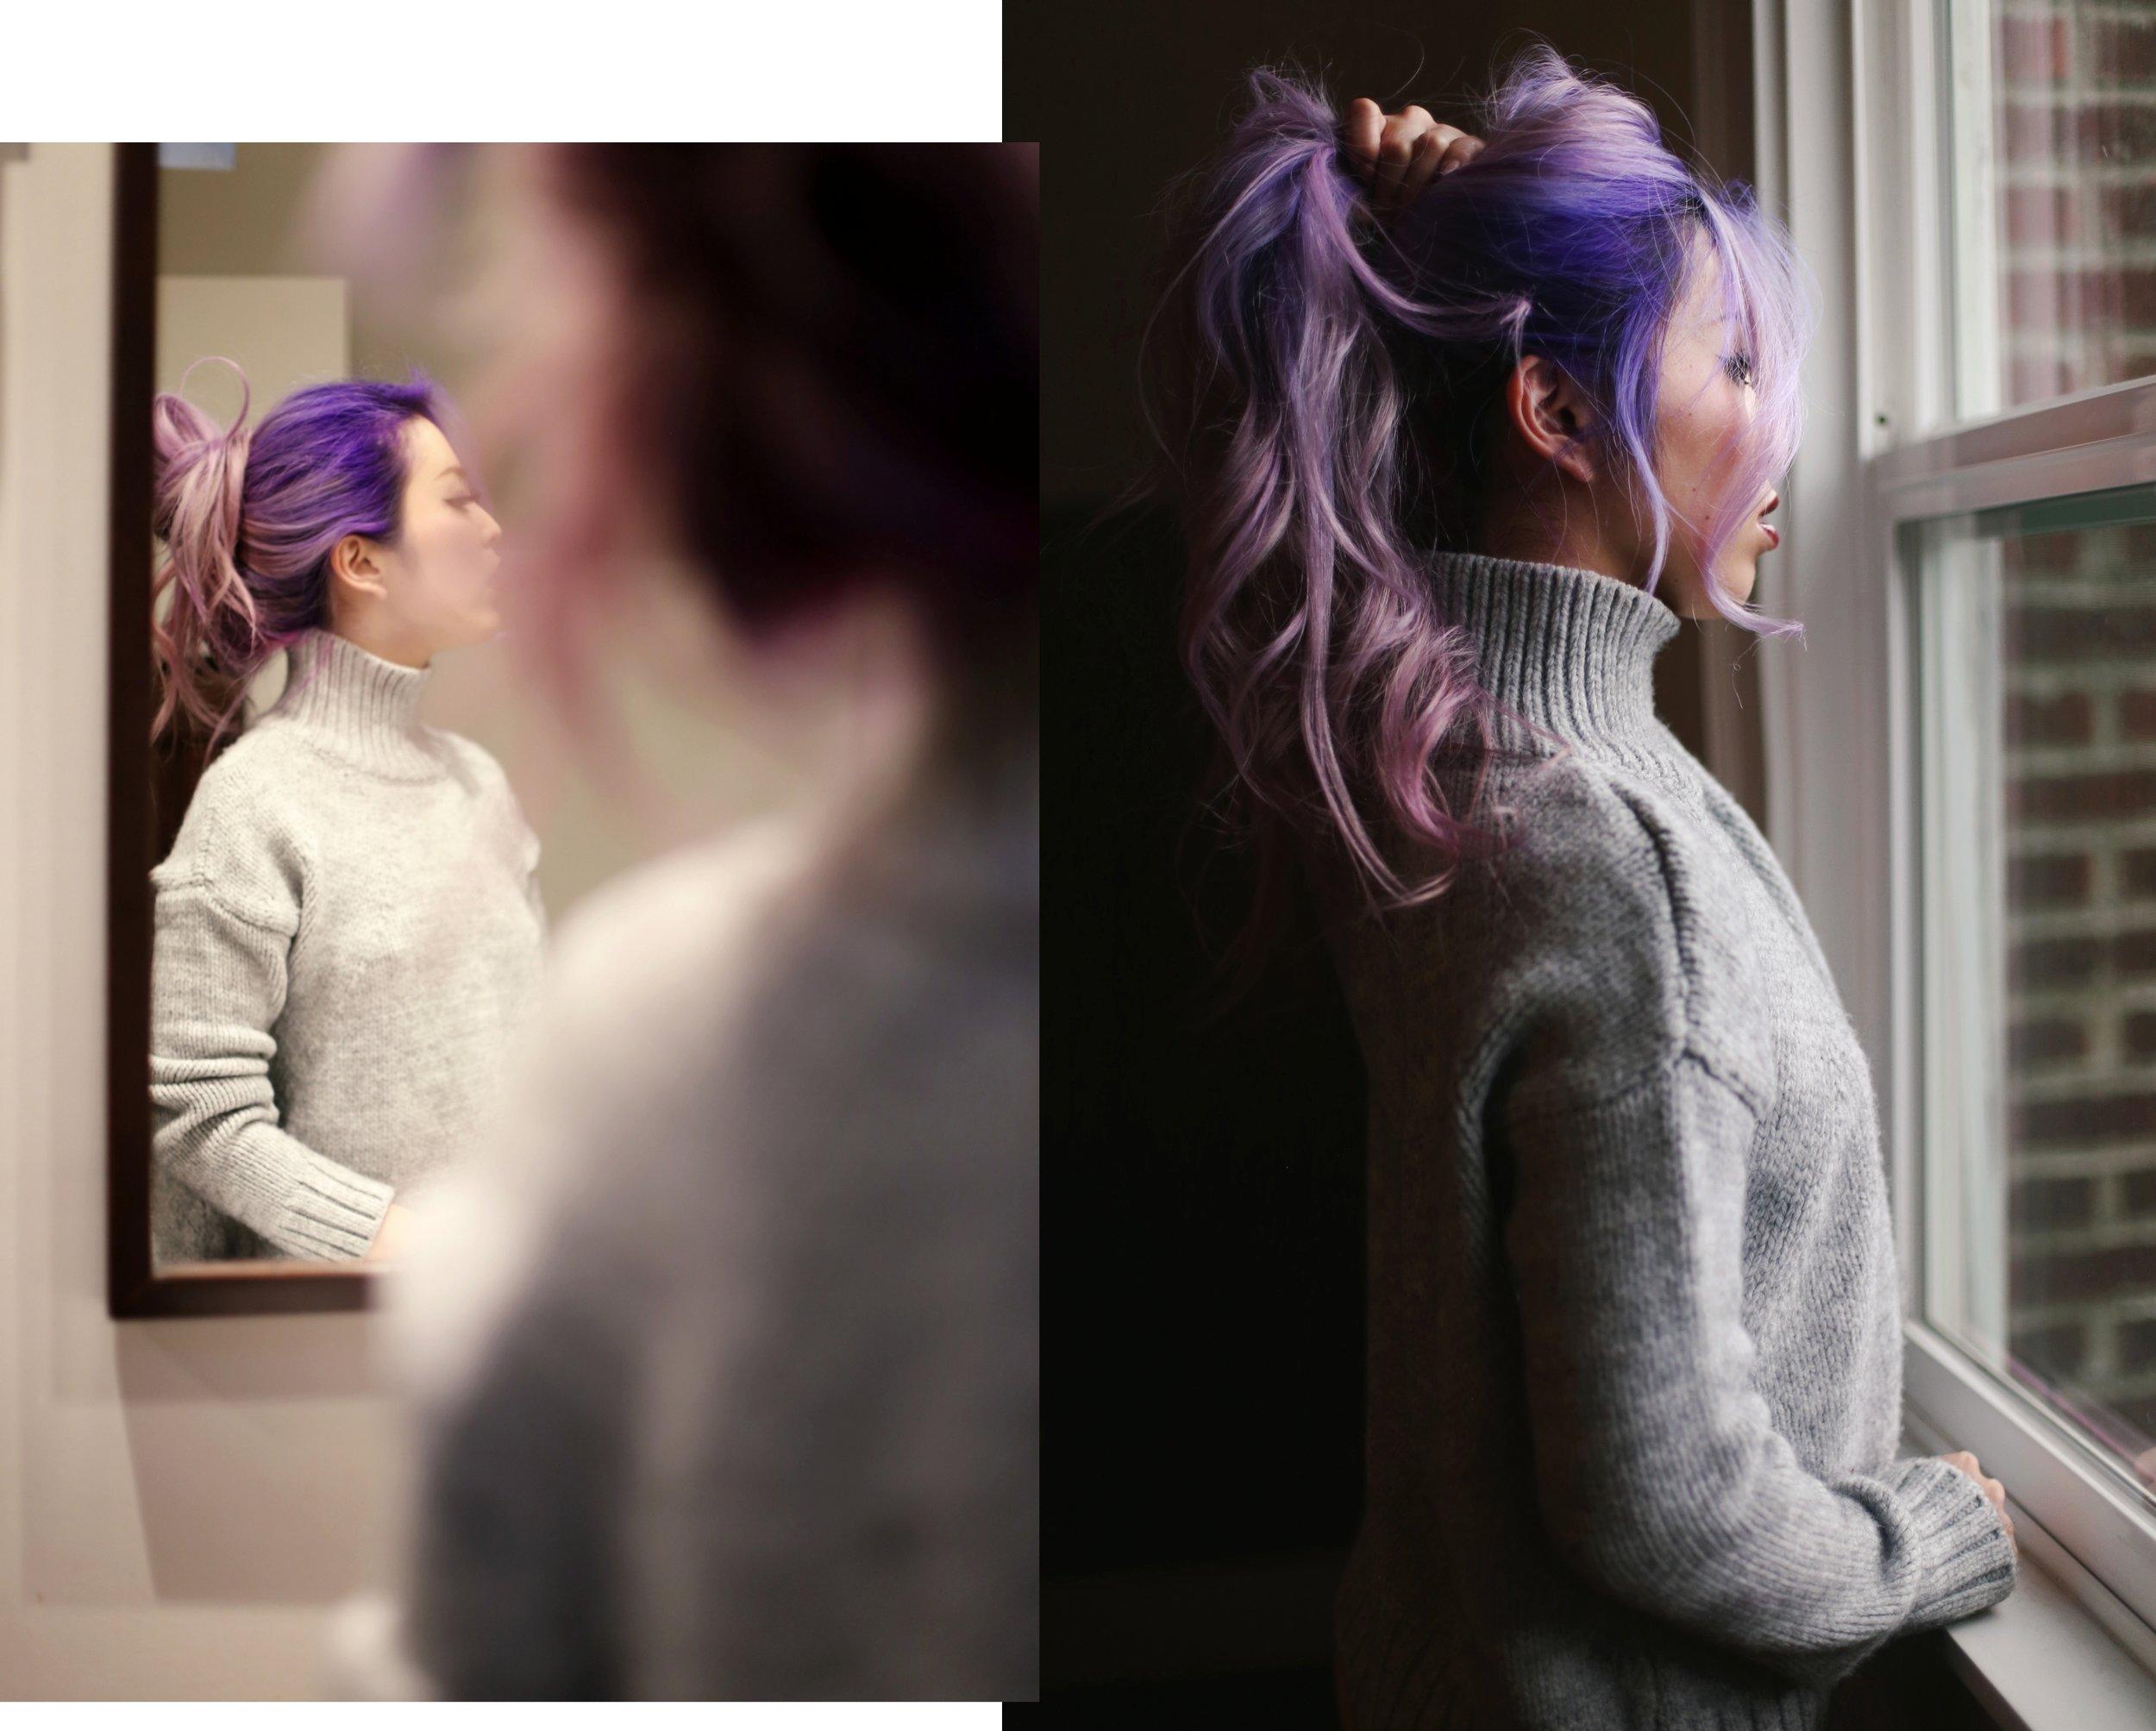 Boudoir Photo-black and white photography-sweater weather-turtle neck sweater-black lingerie-dark lipstick-japanese-Aika's Love Closet-Seattle model-Seattle Style blogger-Lavender Hair-colored Hair-Mermaid Hair-Zara Sweater 7